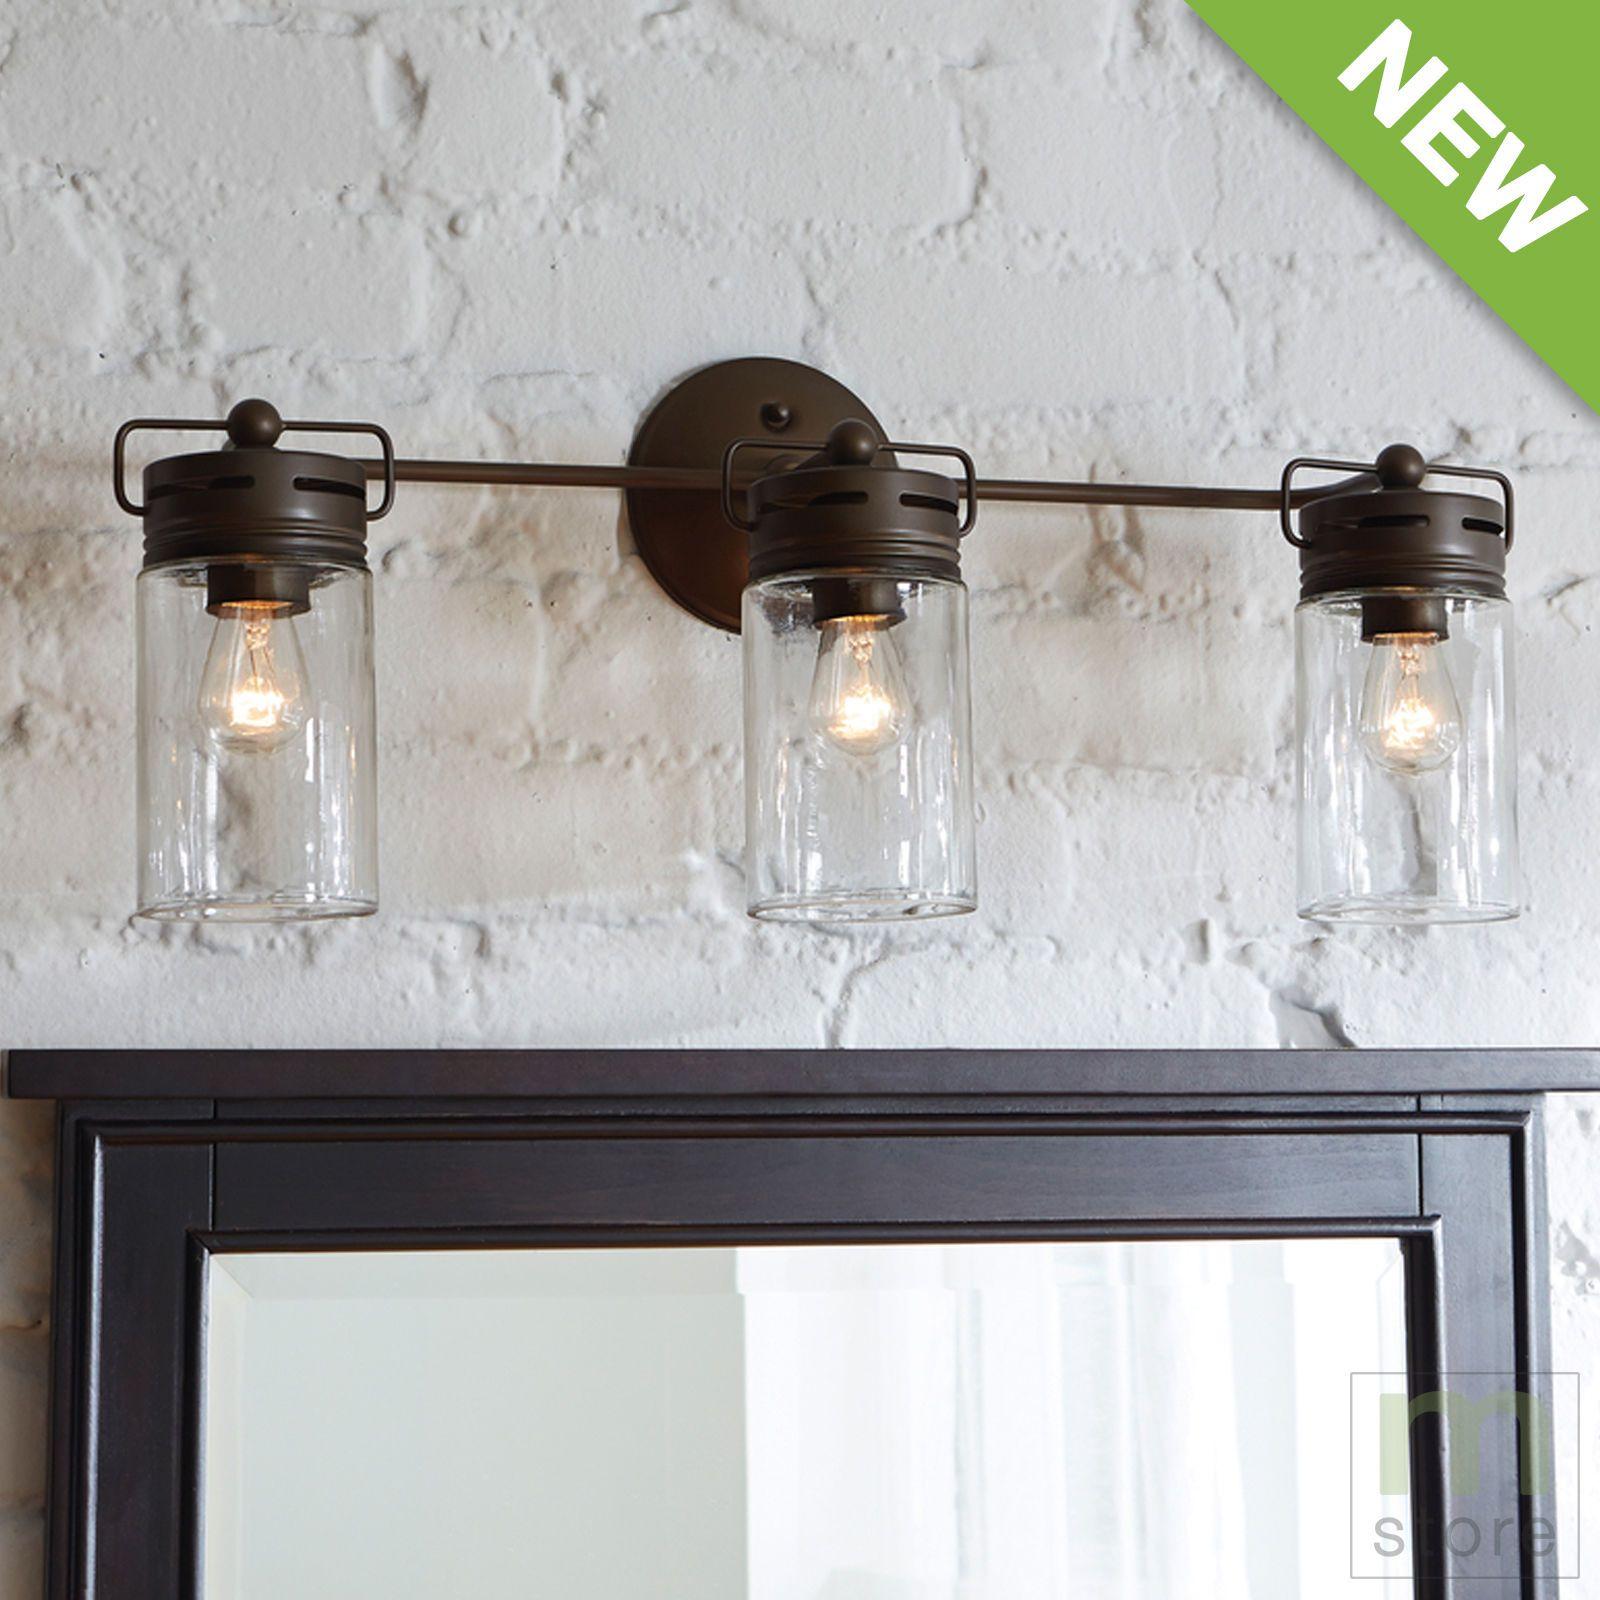 Bathroom Vanity 3 Light Fixture Aged Bronze Mason Jar Wall Lighting Allen Roth Ebay